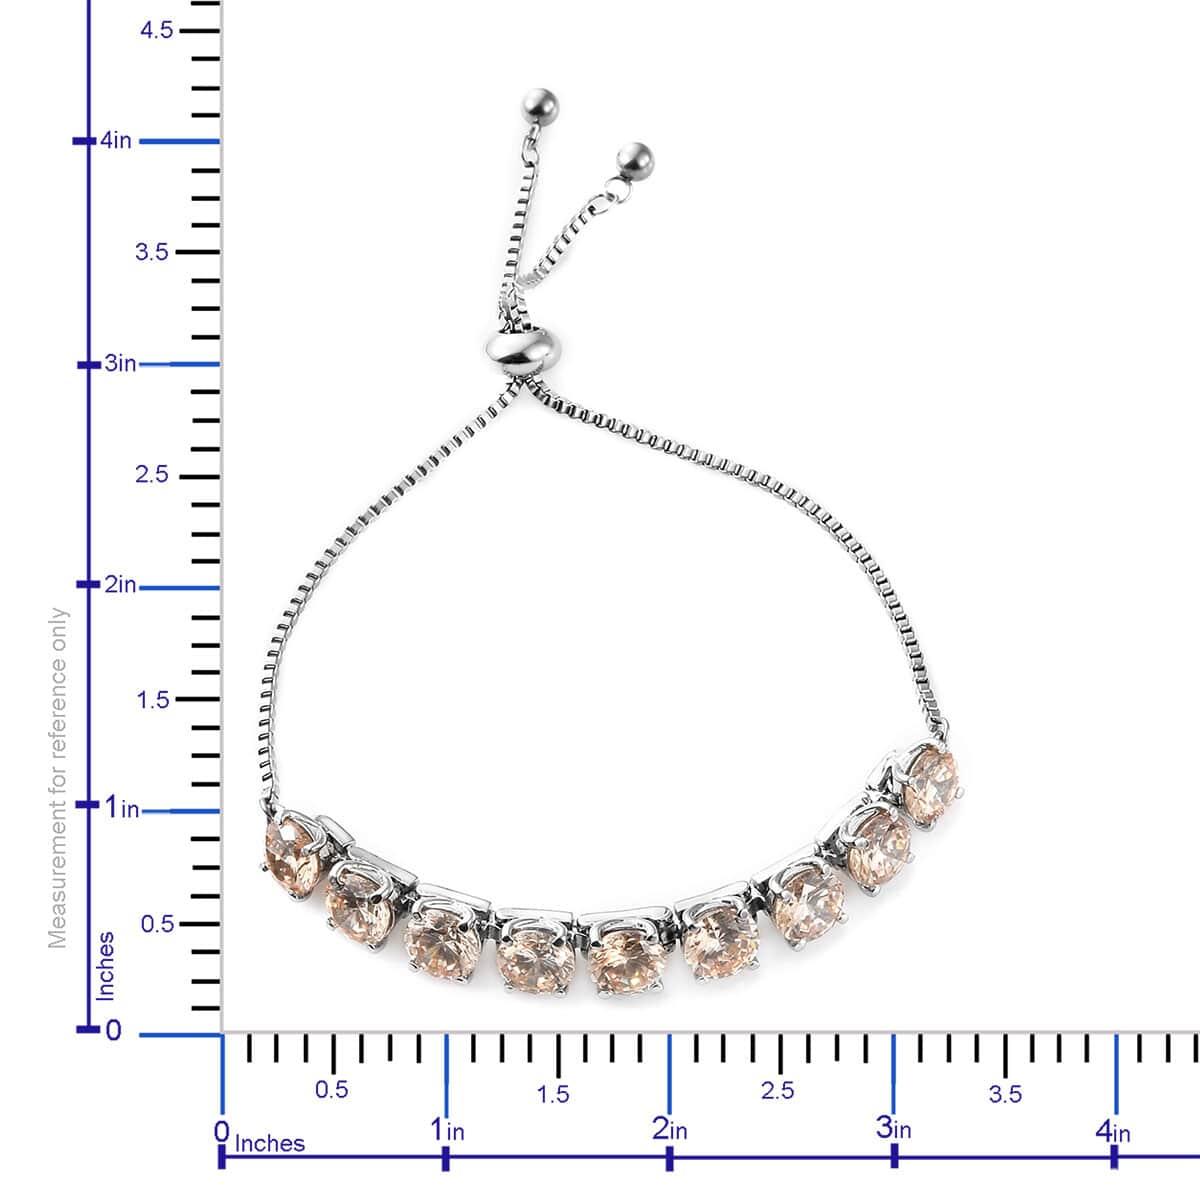 Steel-Cubic-Zirconia-CZ-Orange-Elegant-Adjustable-Bolo-Bracelet-for-Women-Ct-21 thumbnail 18